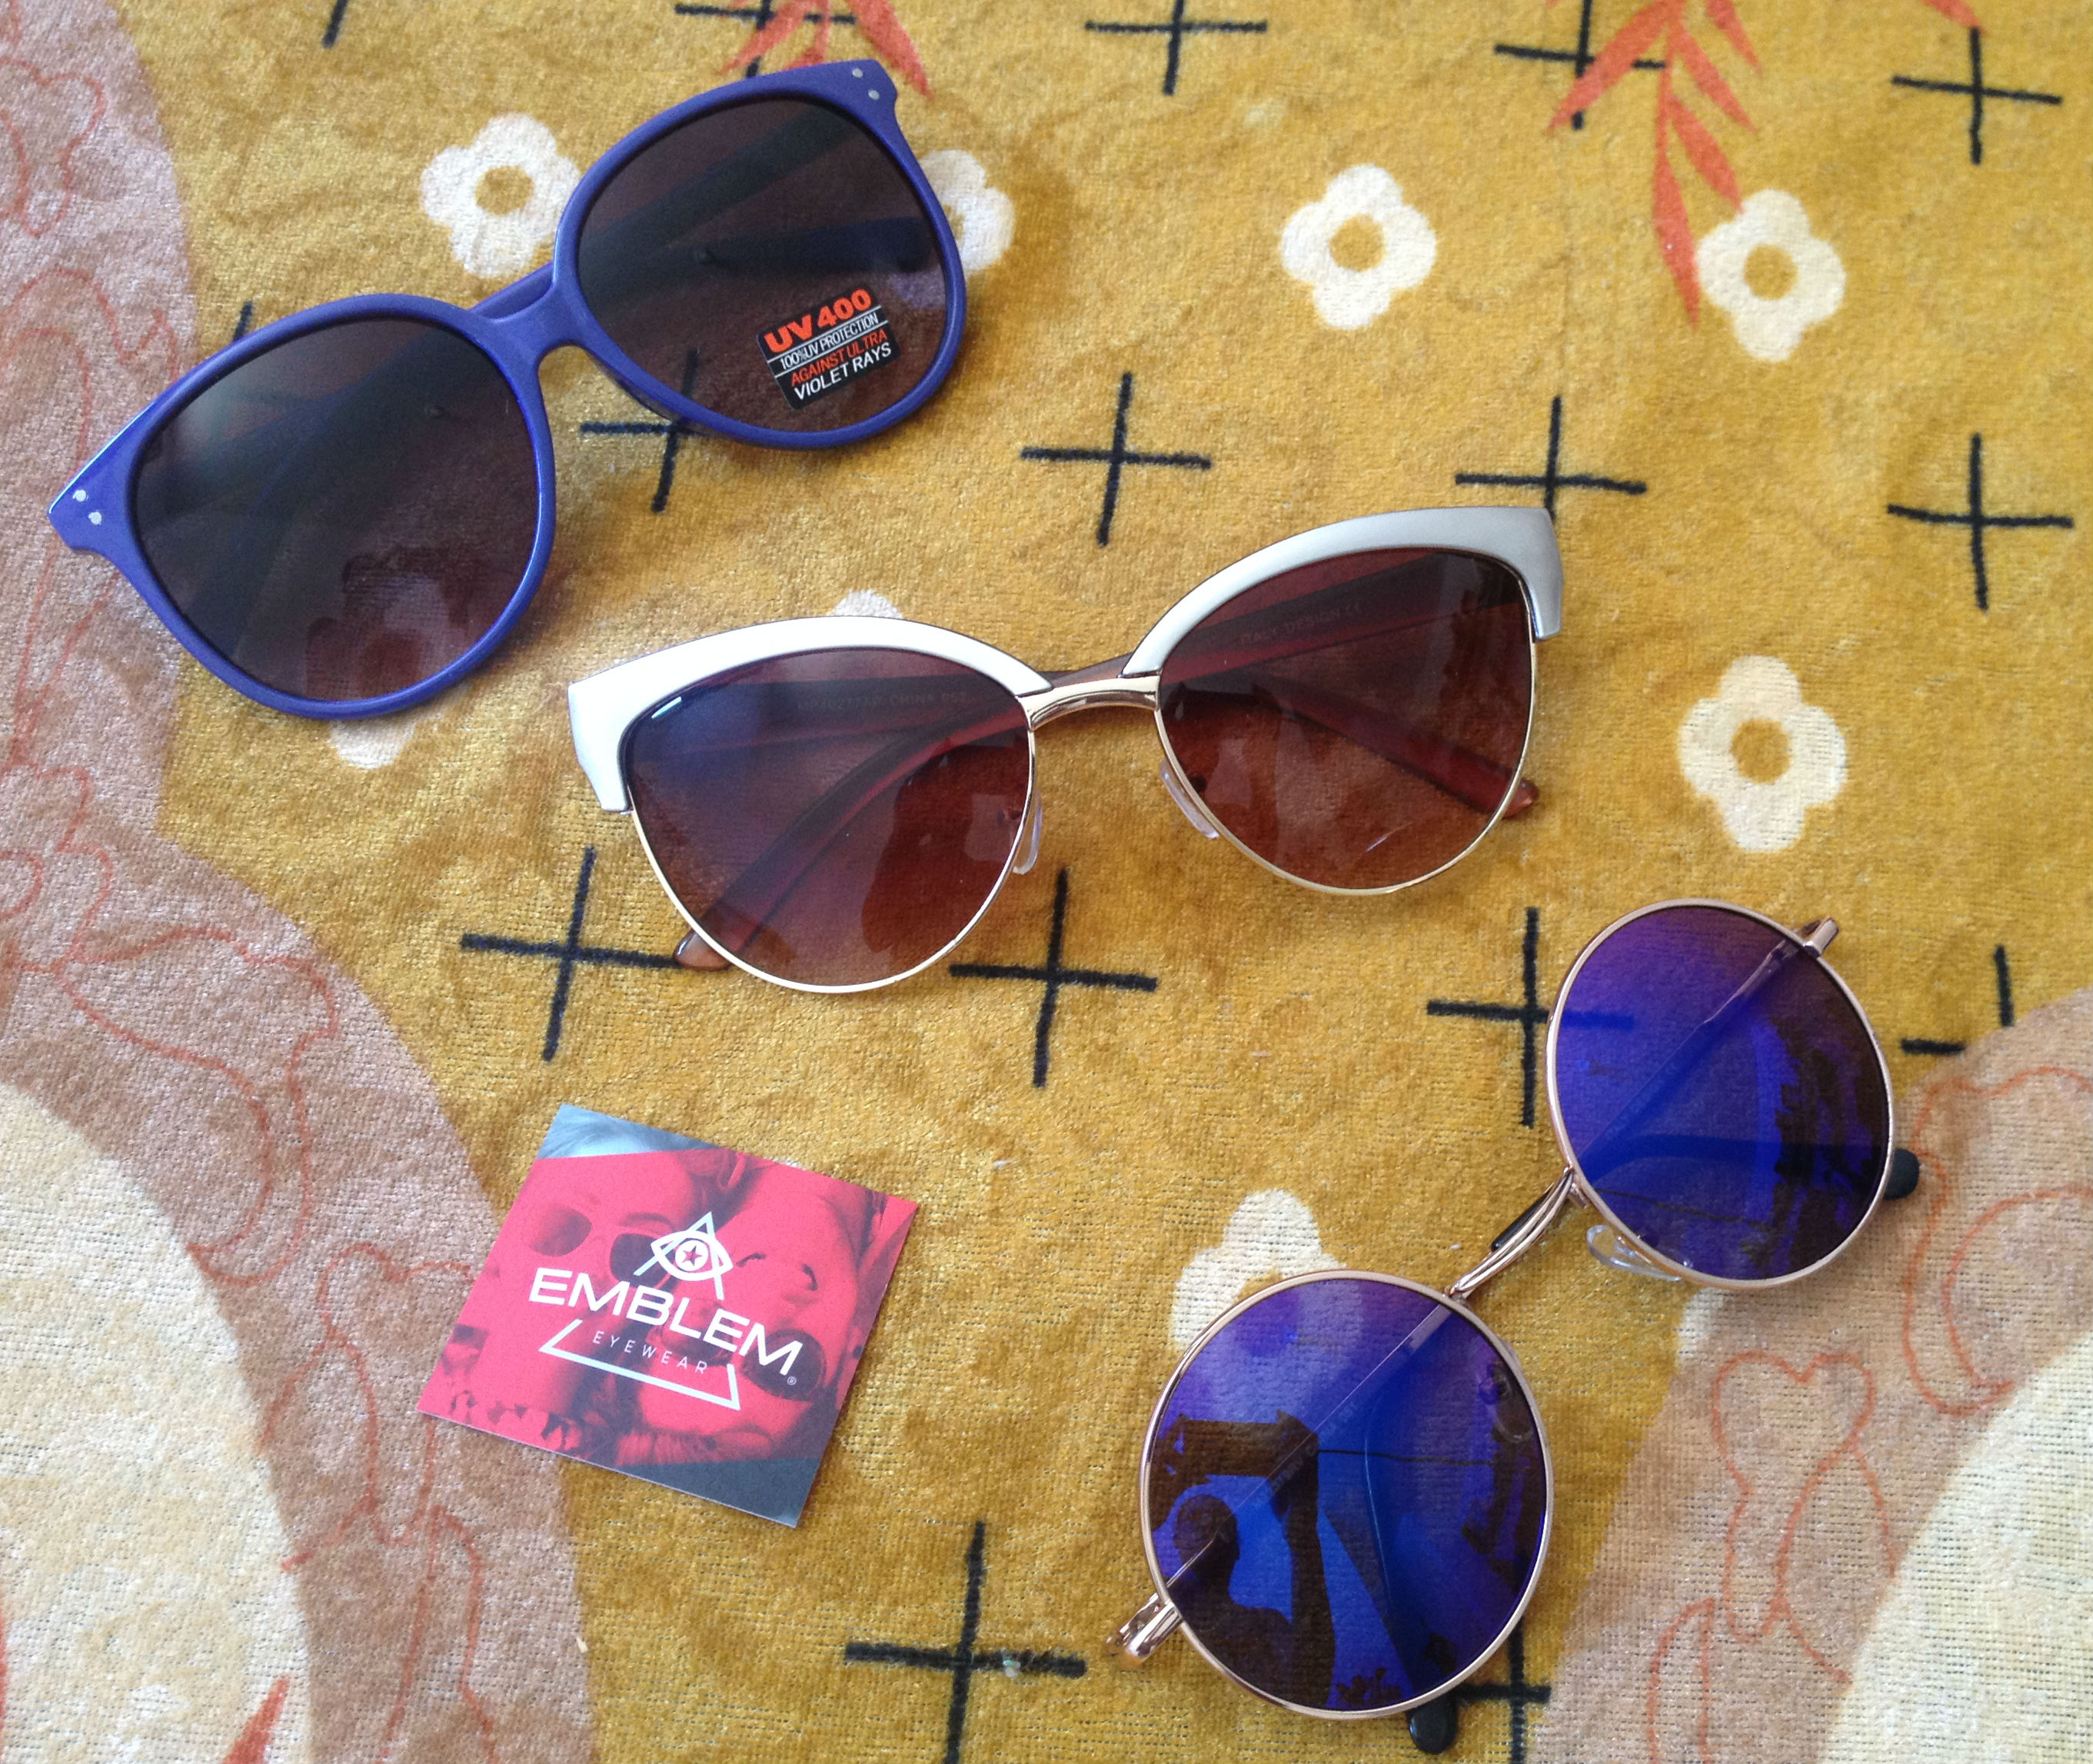 Emblem Eyewear | Sunglasses